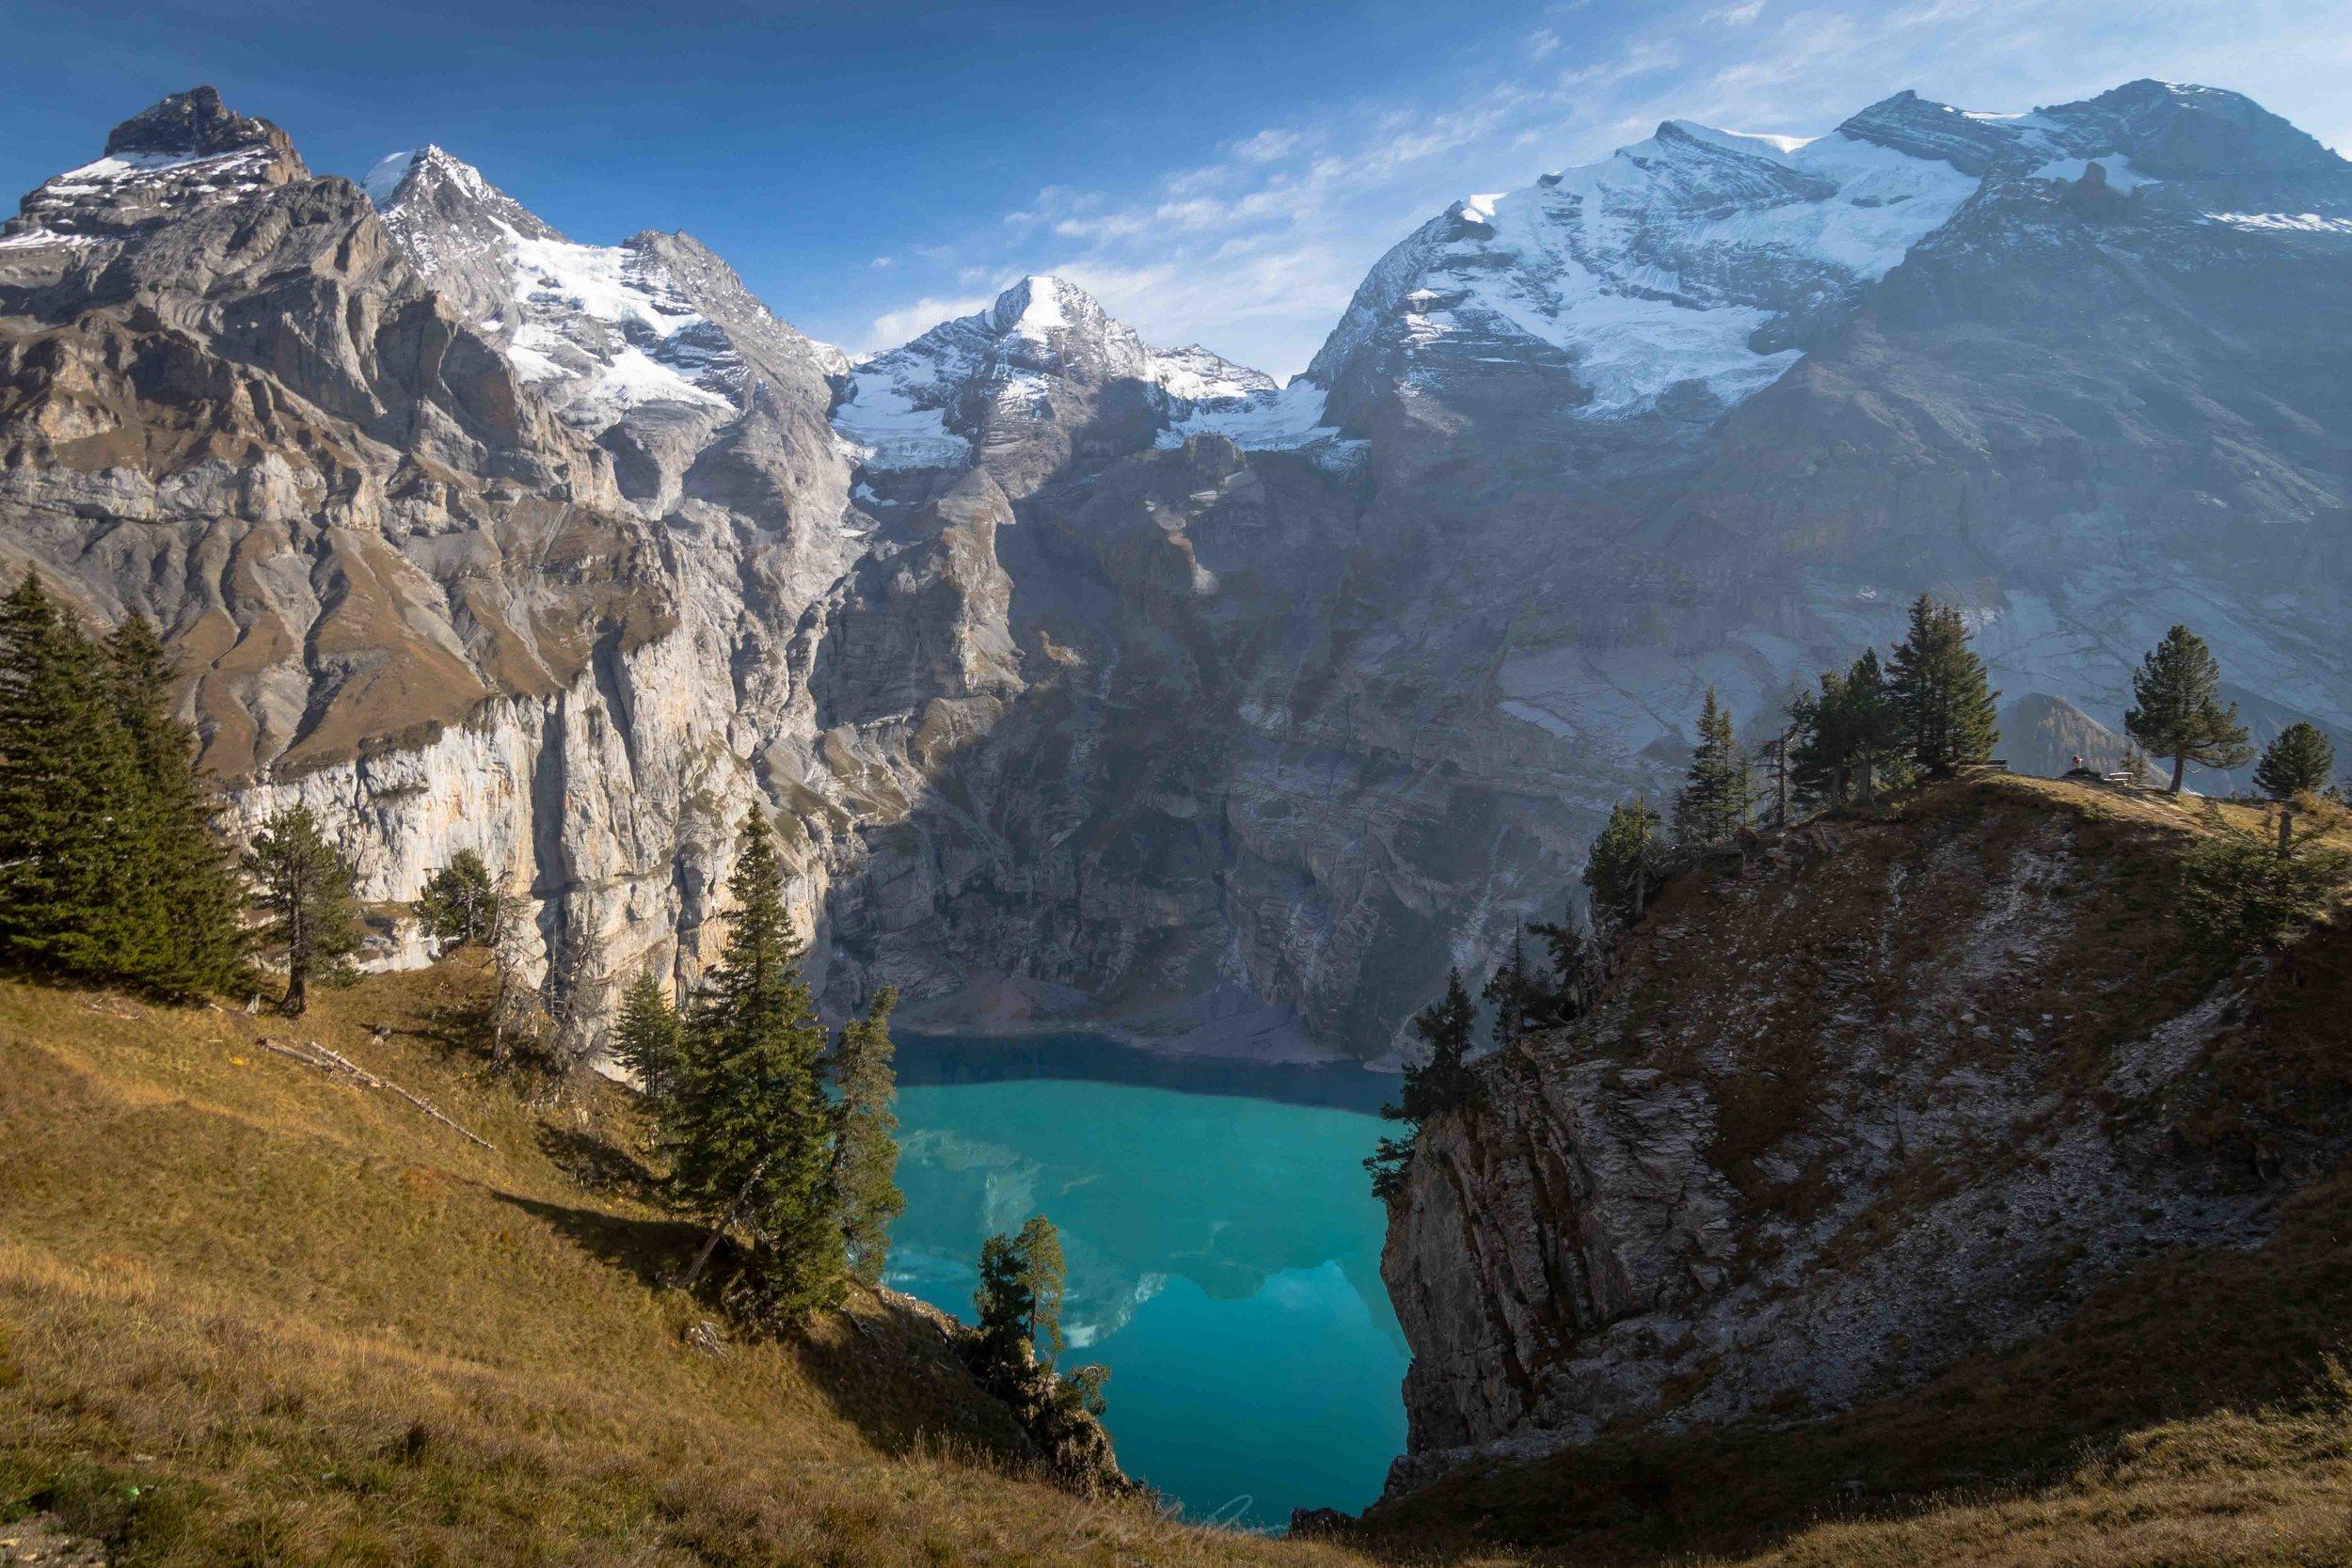 Heuberg Loop Trail View of Oeschinen Lake in Bernese Oberland Switzerland